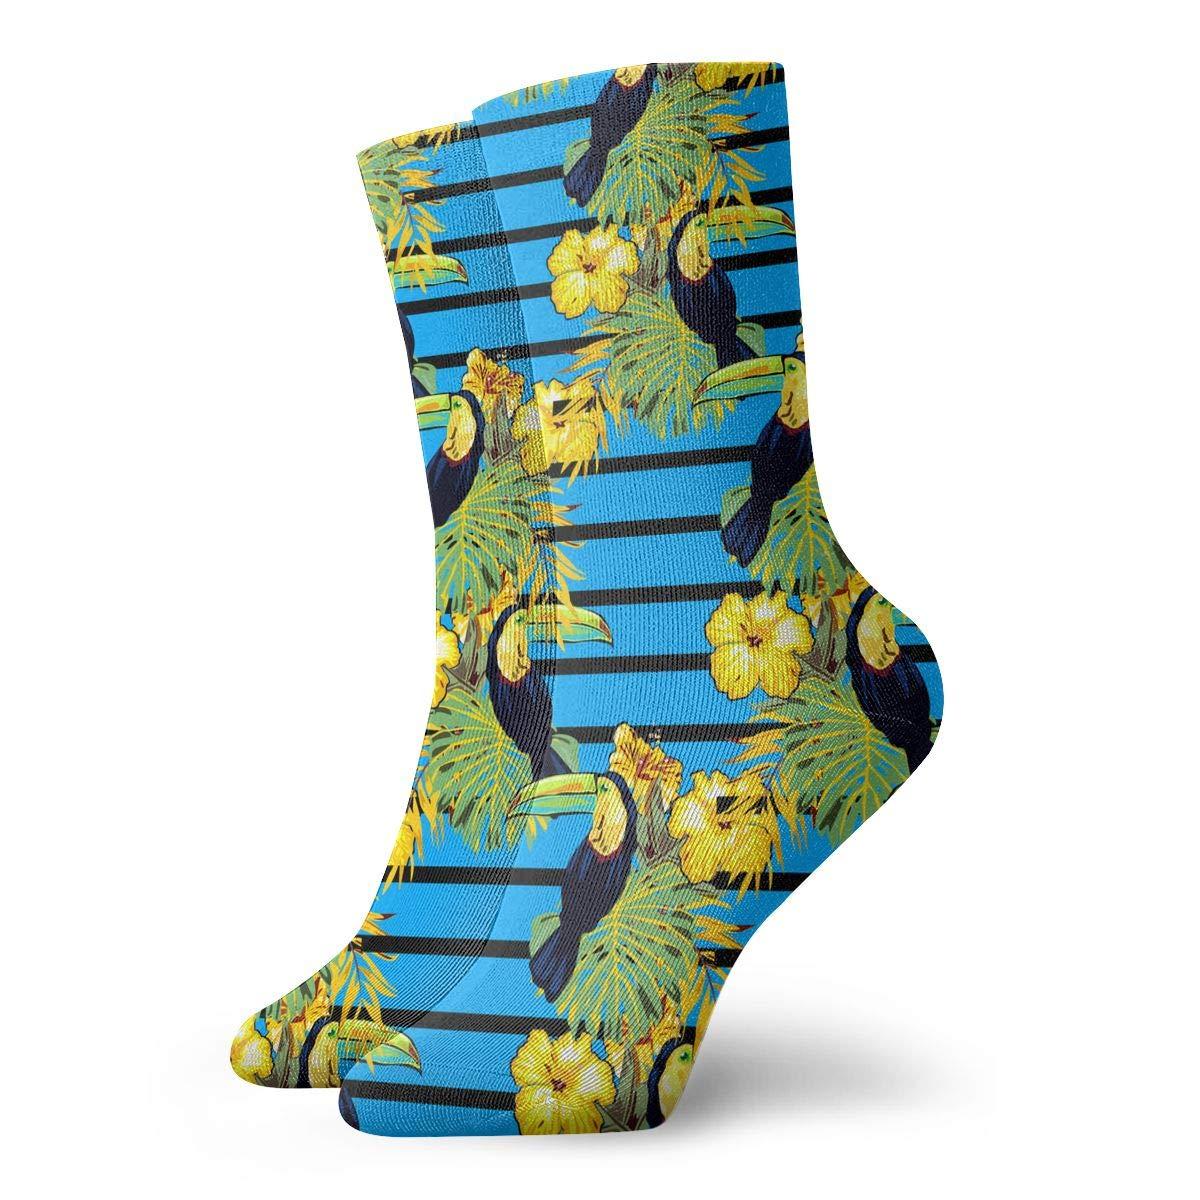 Pair Of Birds Toucan On Branch Tropical Tree Against The Sky Fashion Dress Socks Short Socks Leisure Travel 11.8 Inch